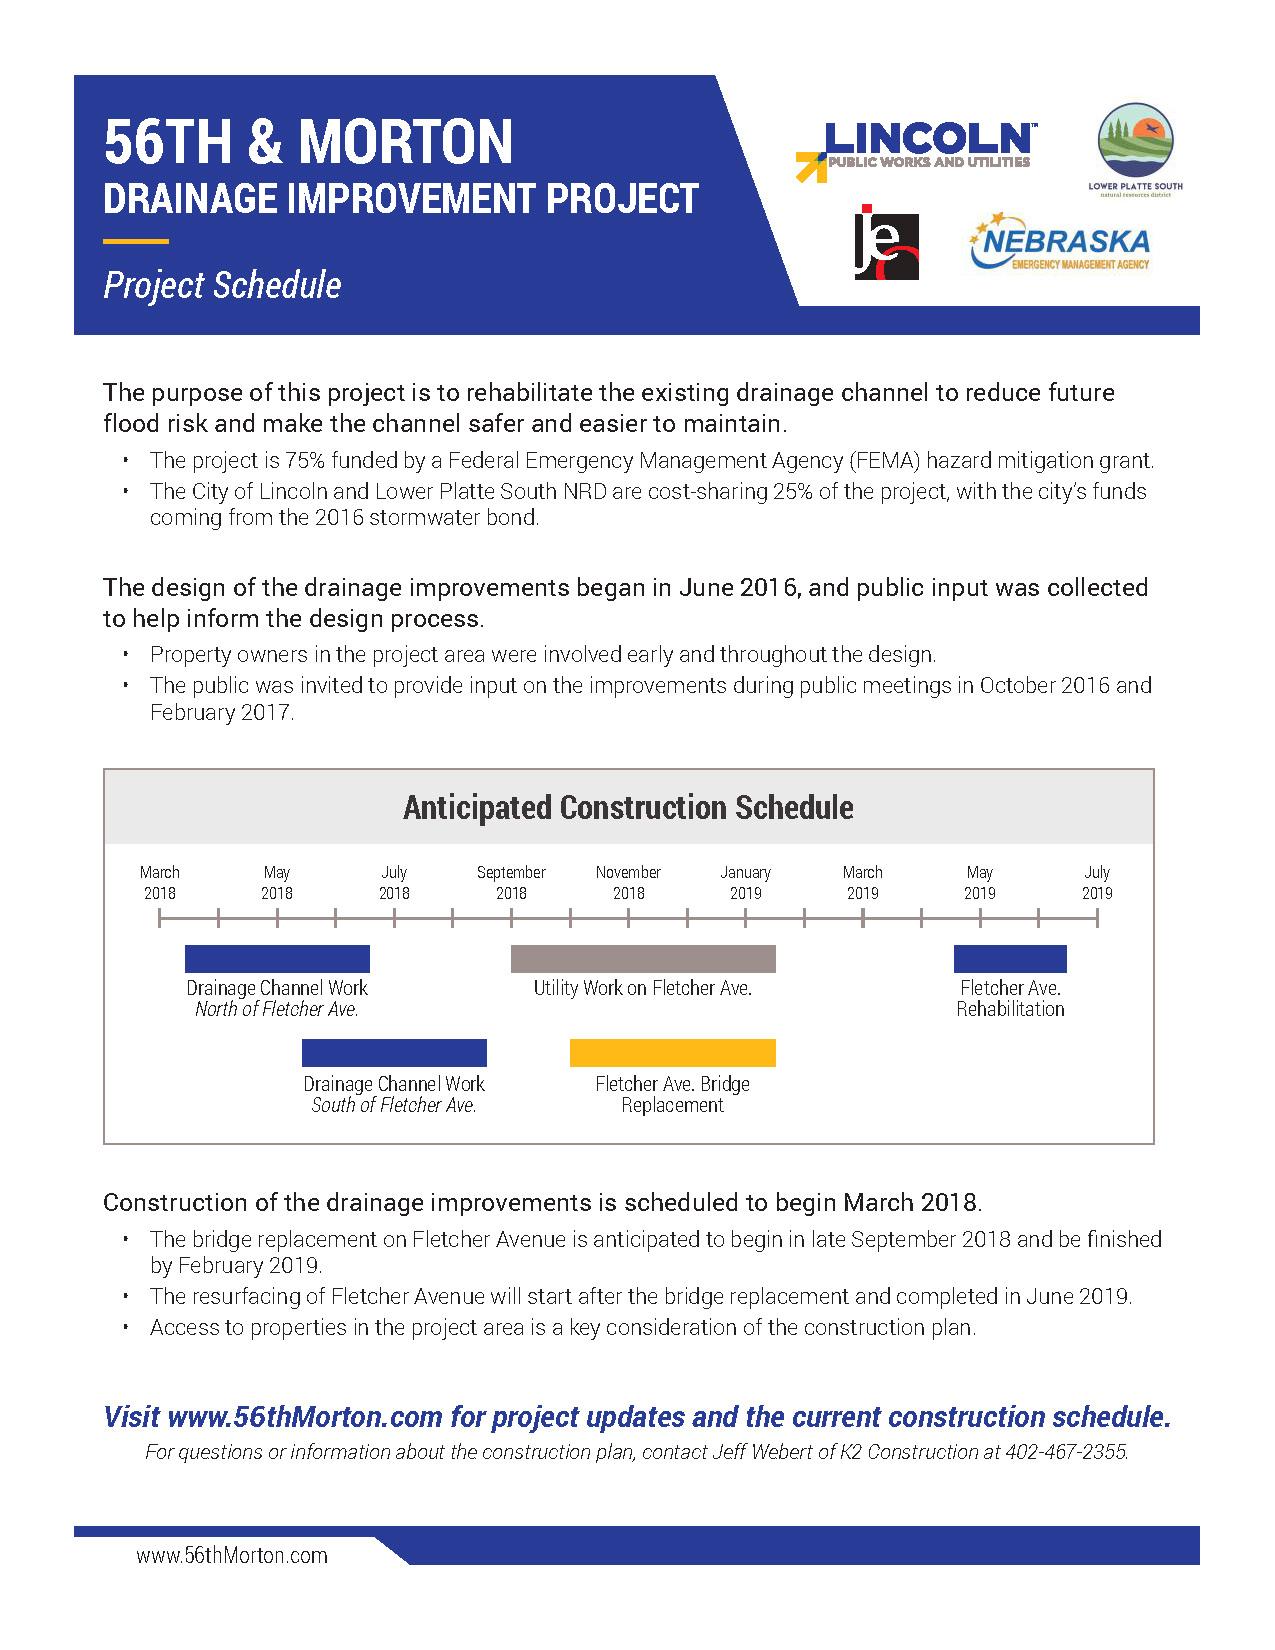 56thMorton_Handout2_Project Schedule-min.jpg